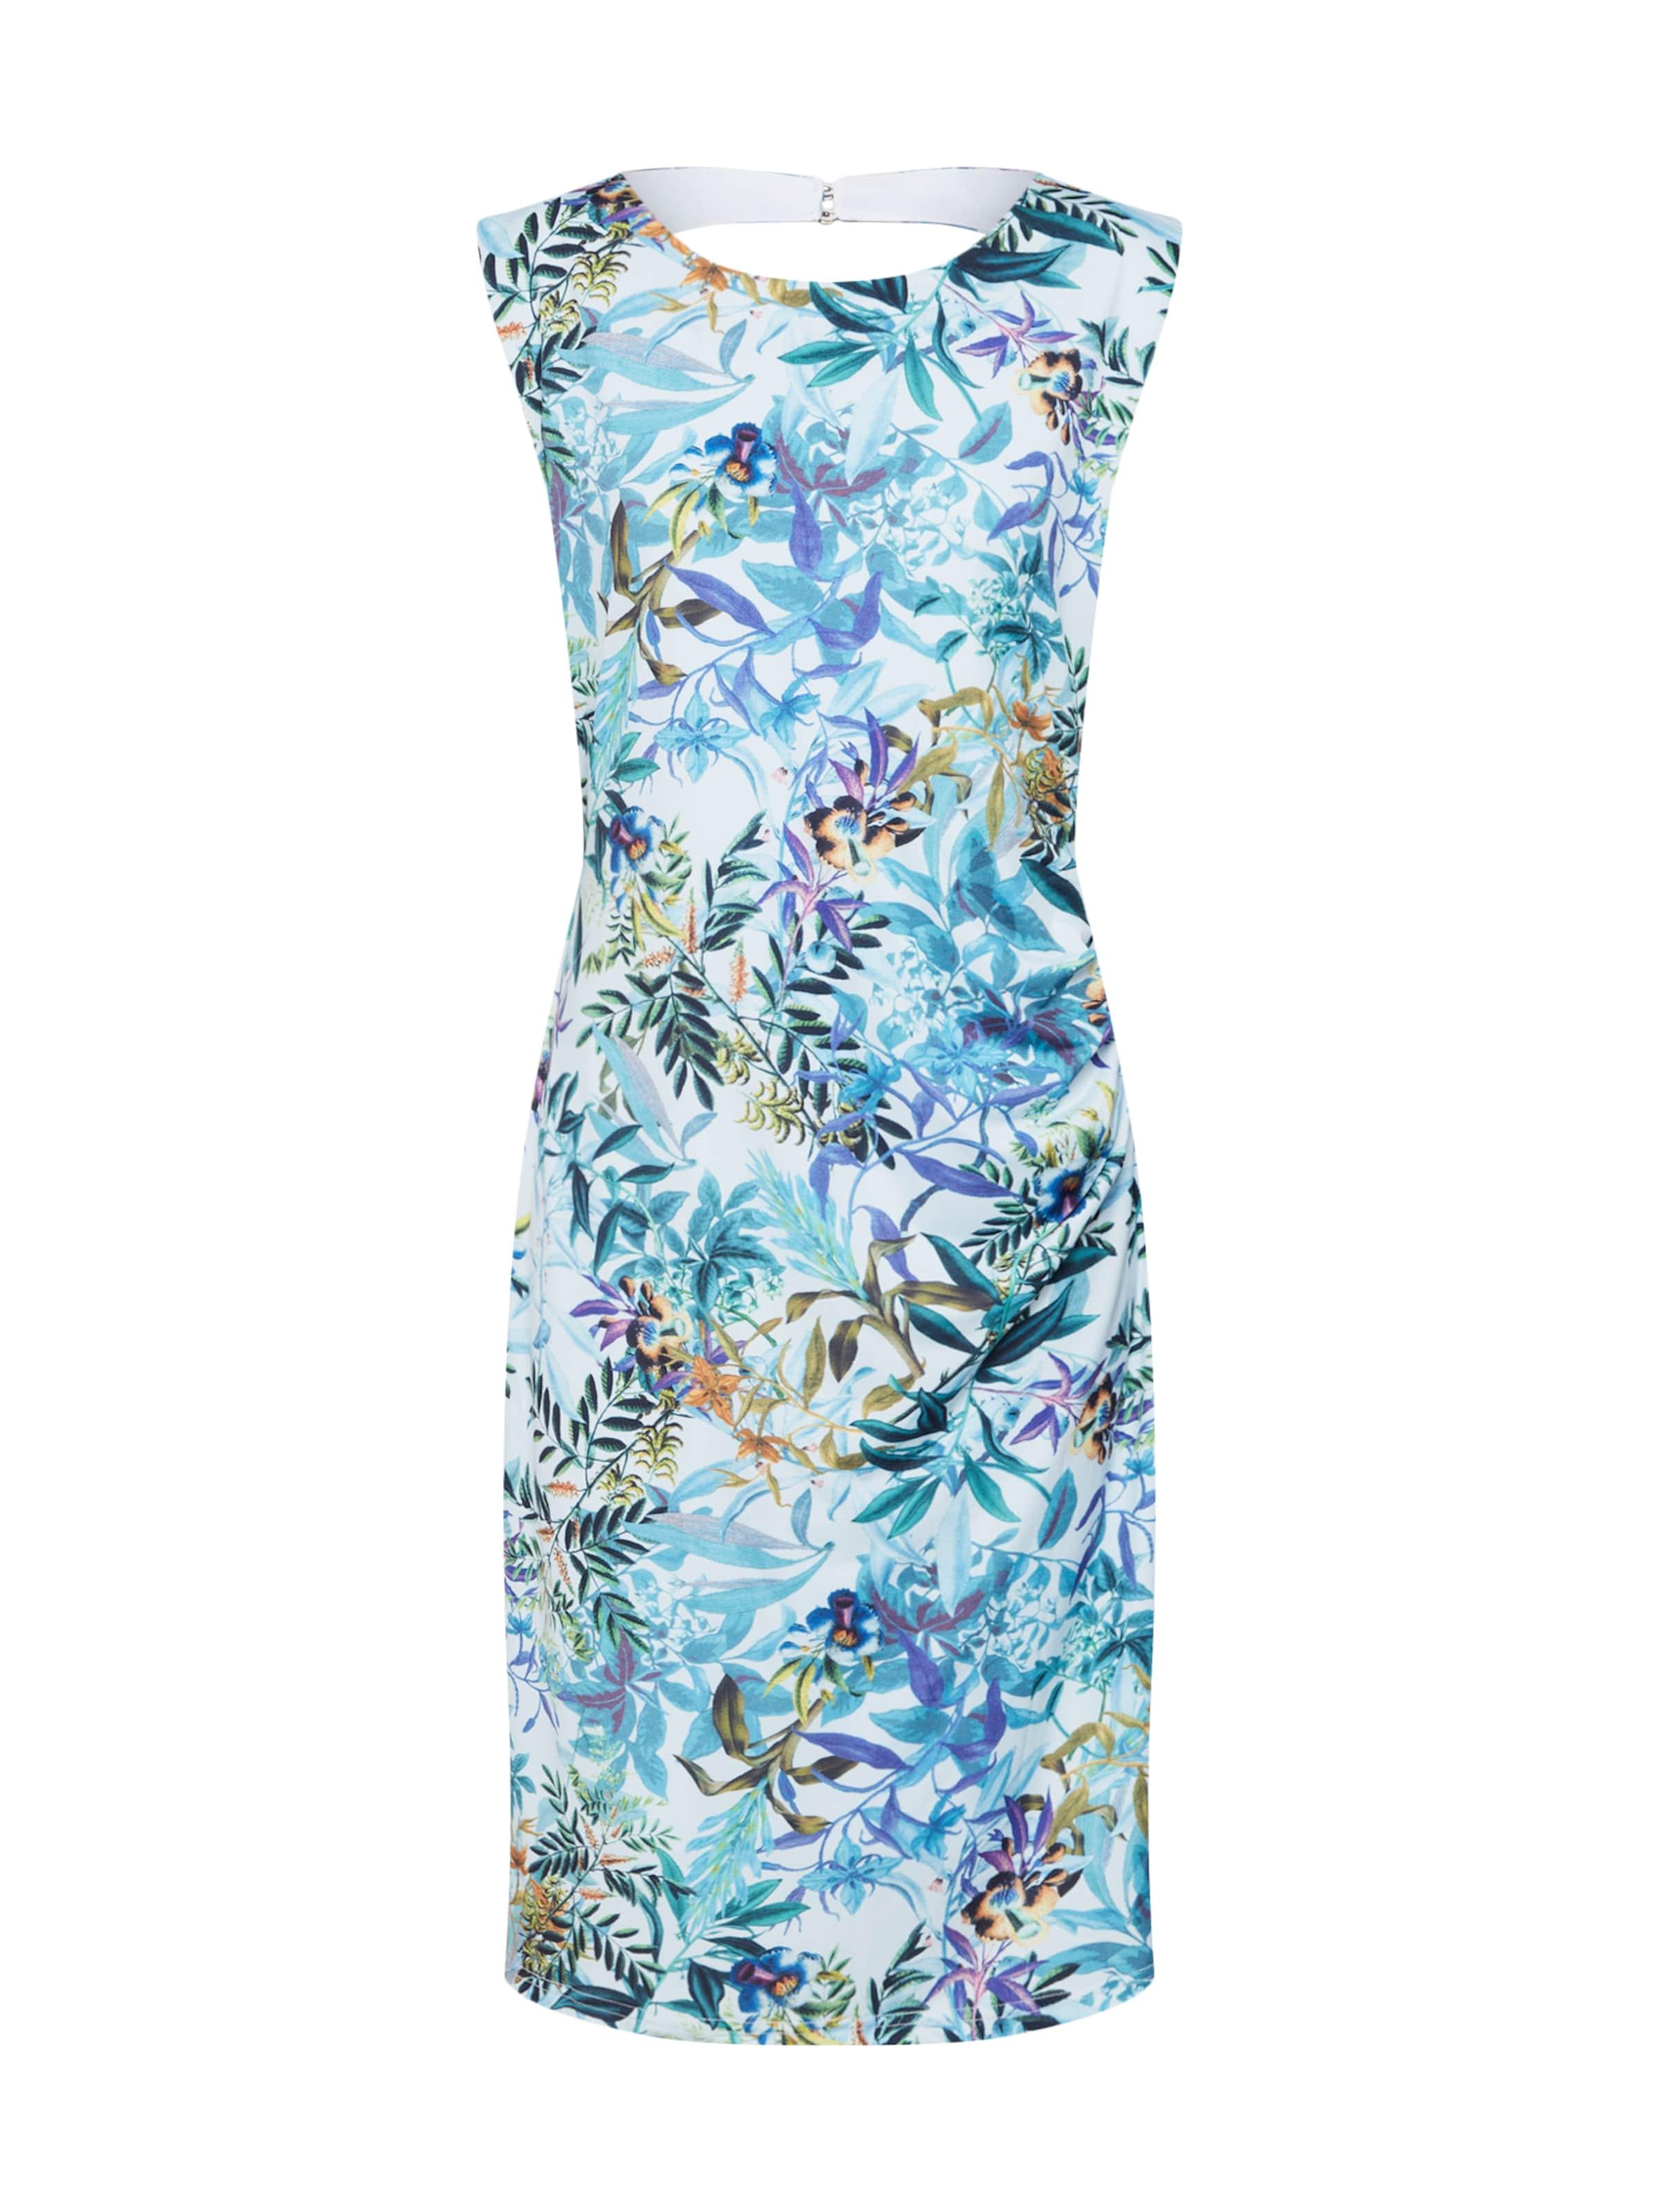 HellblauMischfarben Dress' Jersey Kleid 'karuba Kaffe In Ow80kXnP